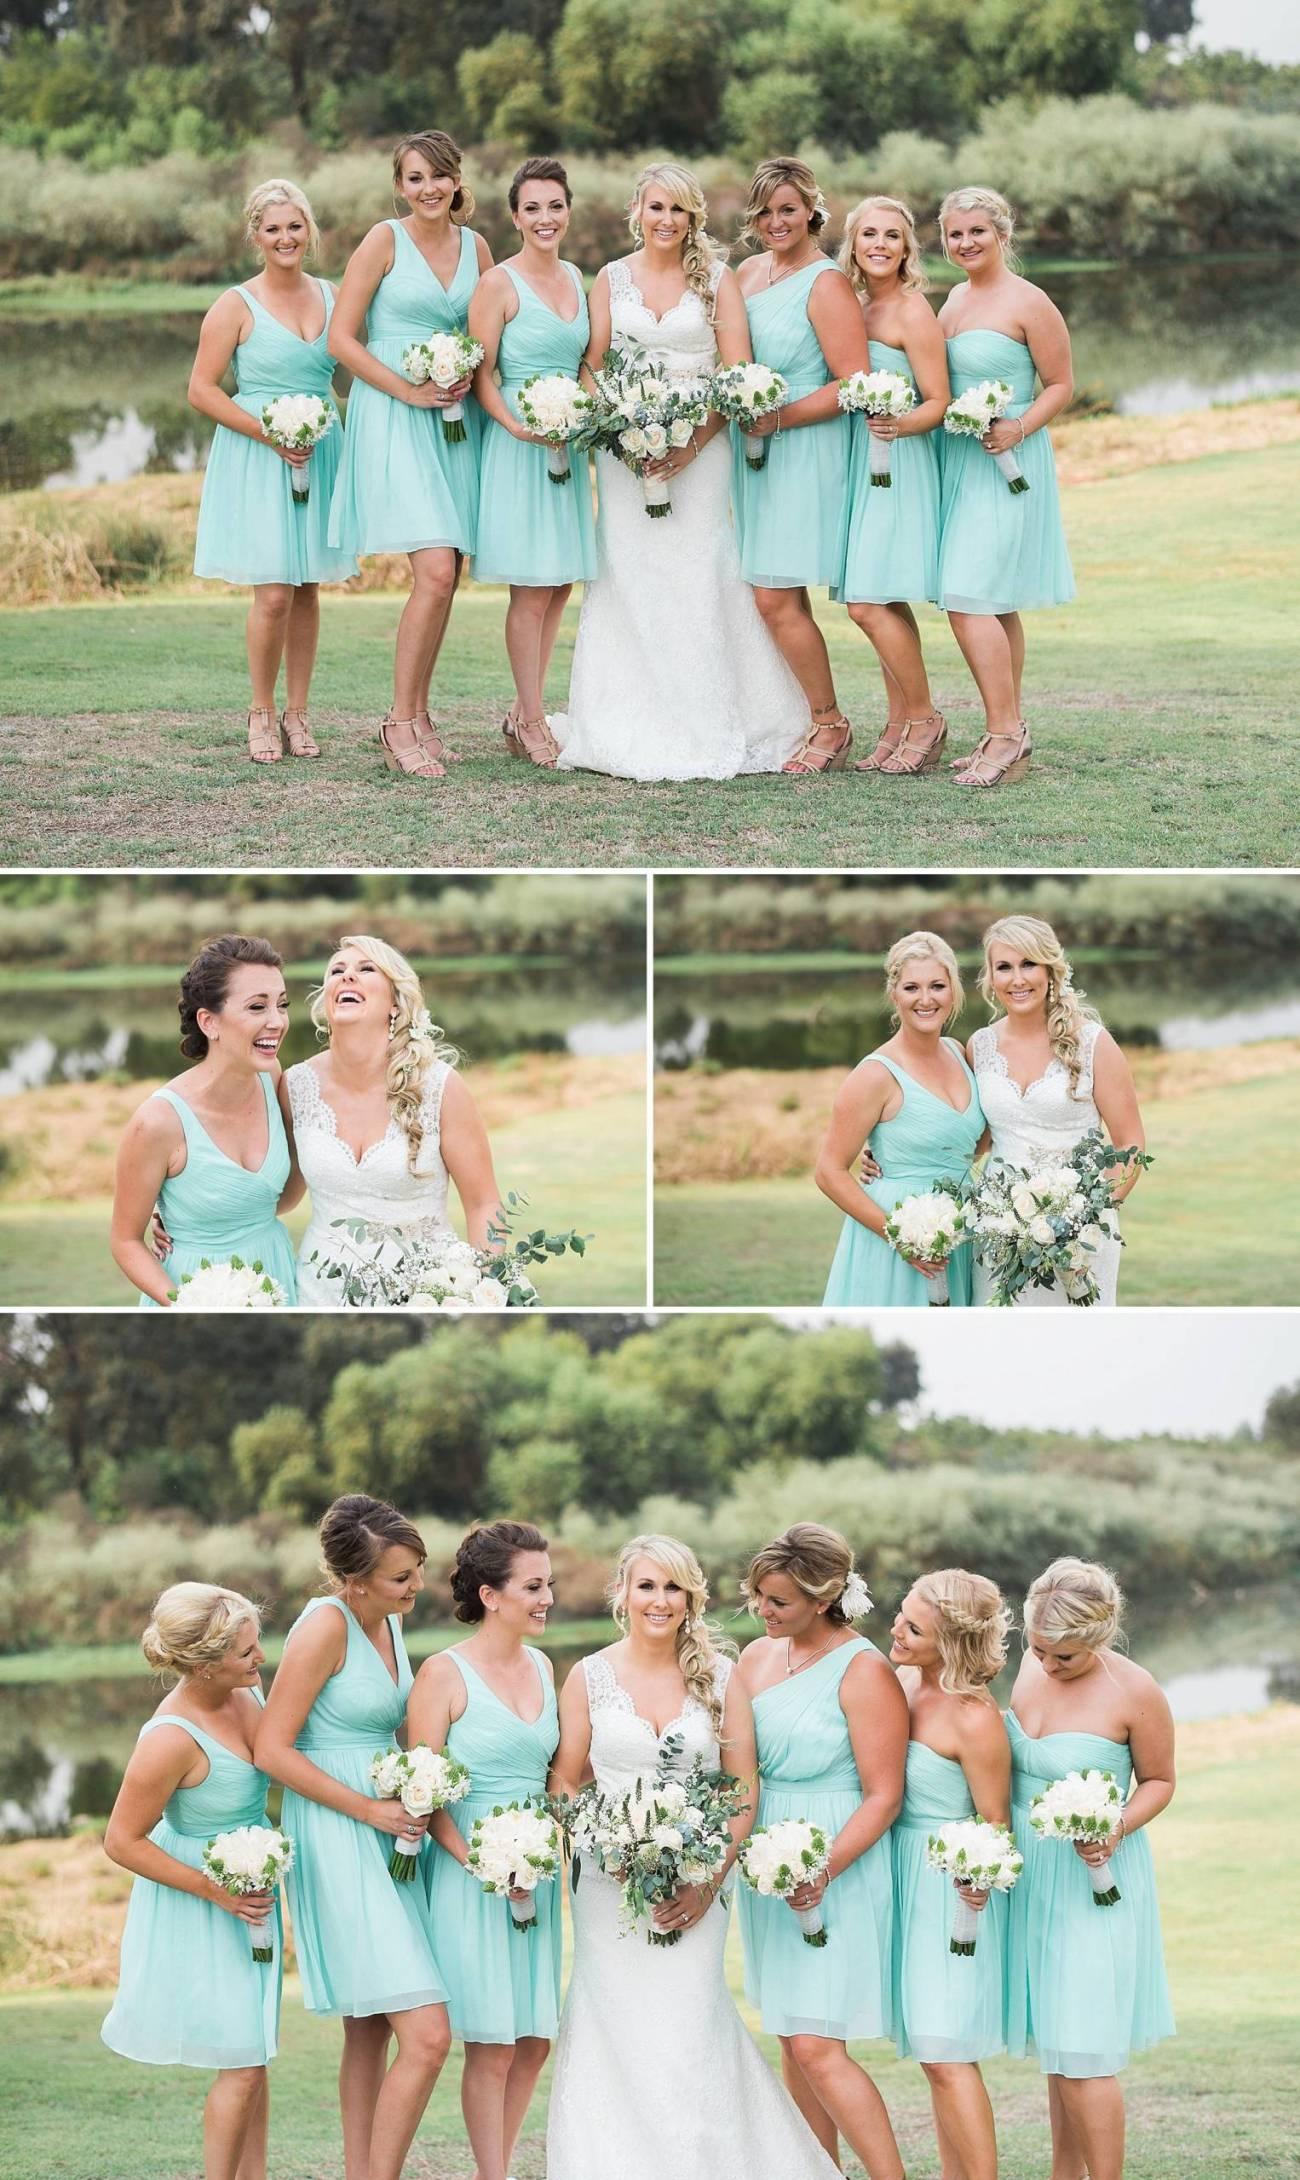 Erin + Marcel Third Element Photography & Cinema Fresno County Estate Wedding Hybrid Film Wedding Photographer_0020